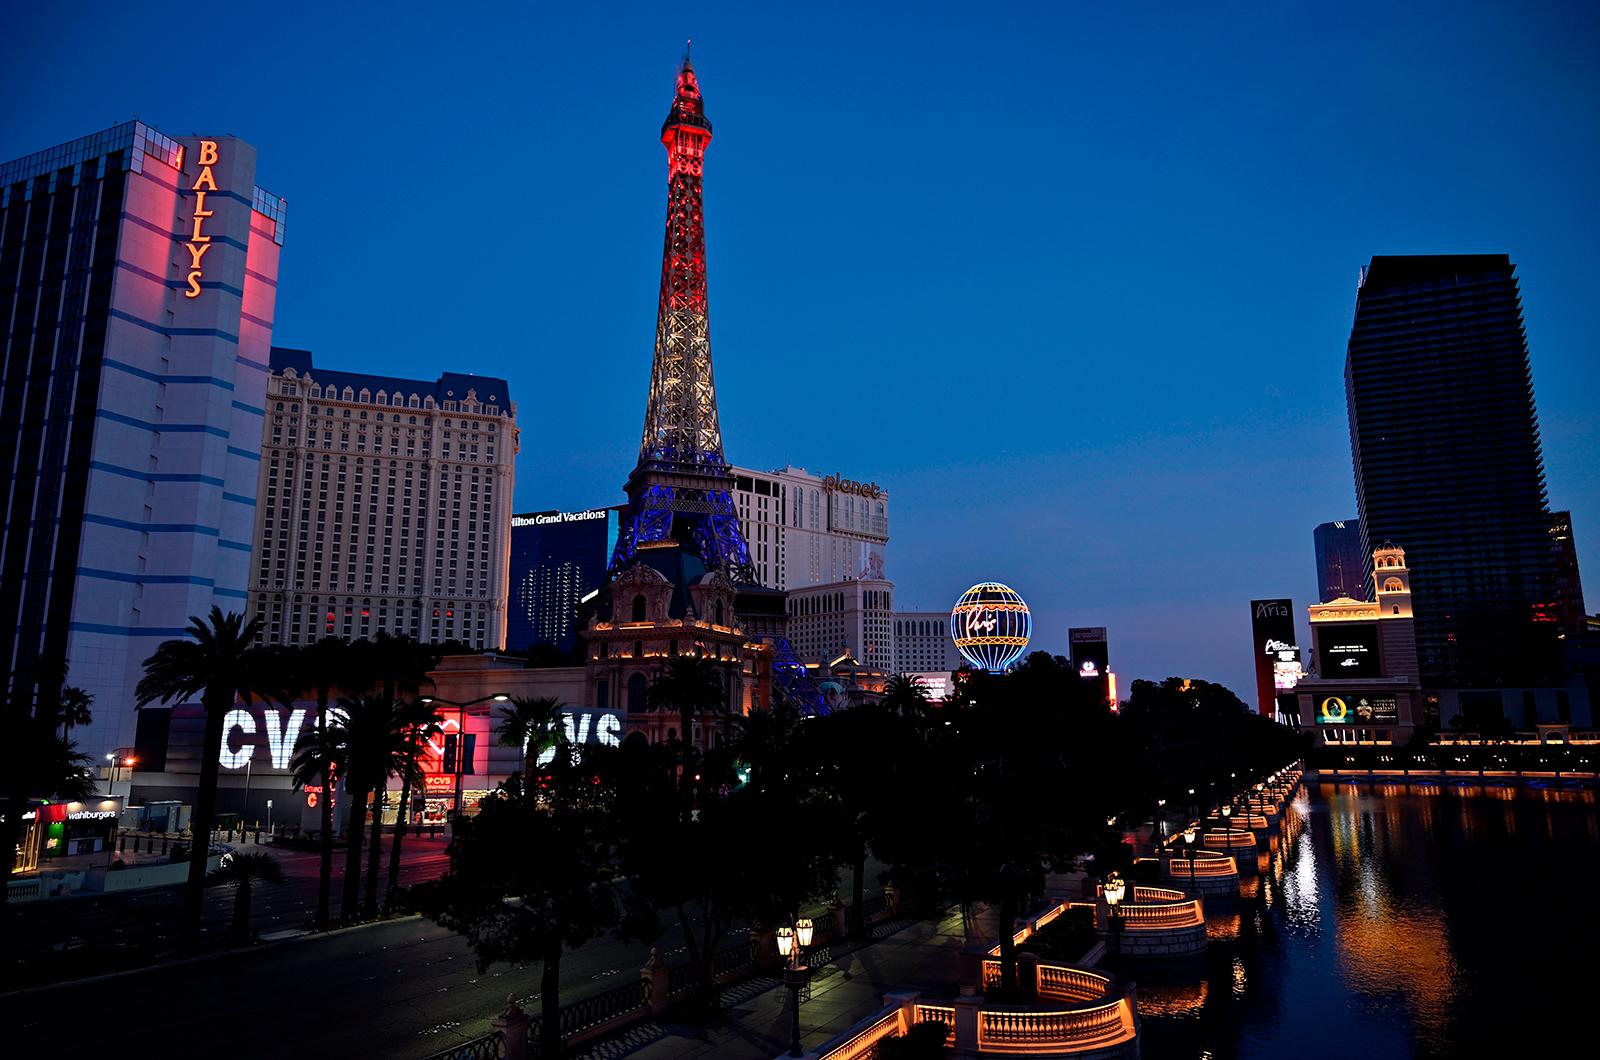 The Las Vegas Strip is seen devoid of traffic on April 27, in Las Vegas, Nevada.